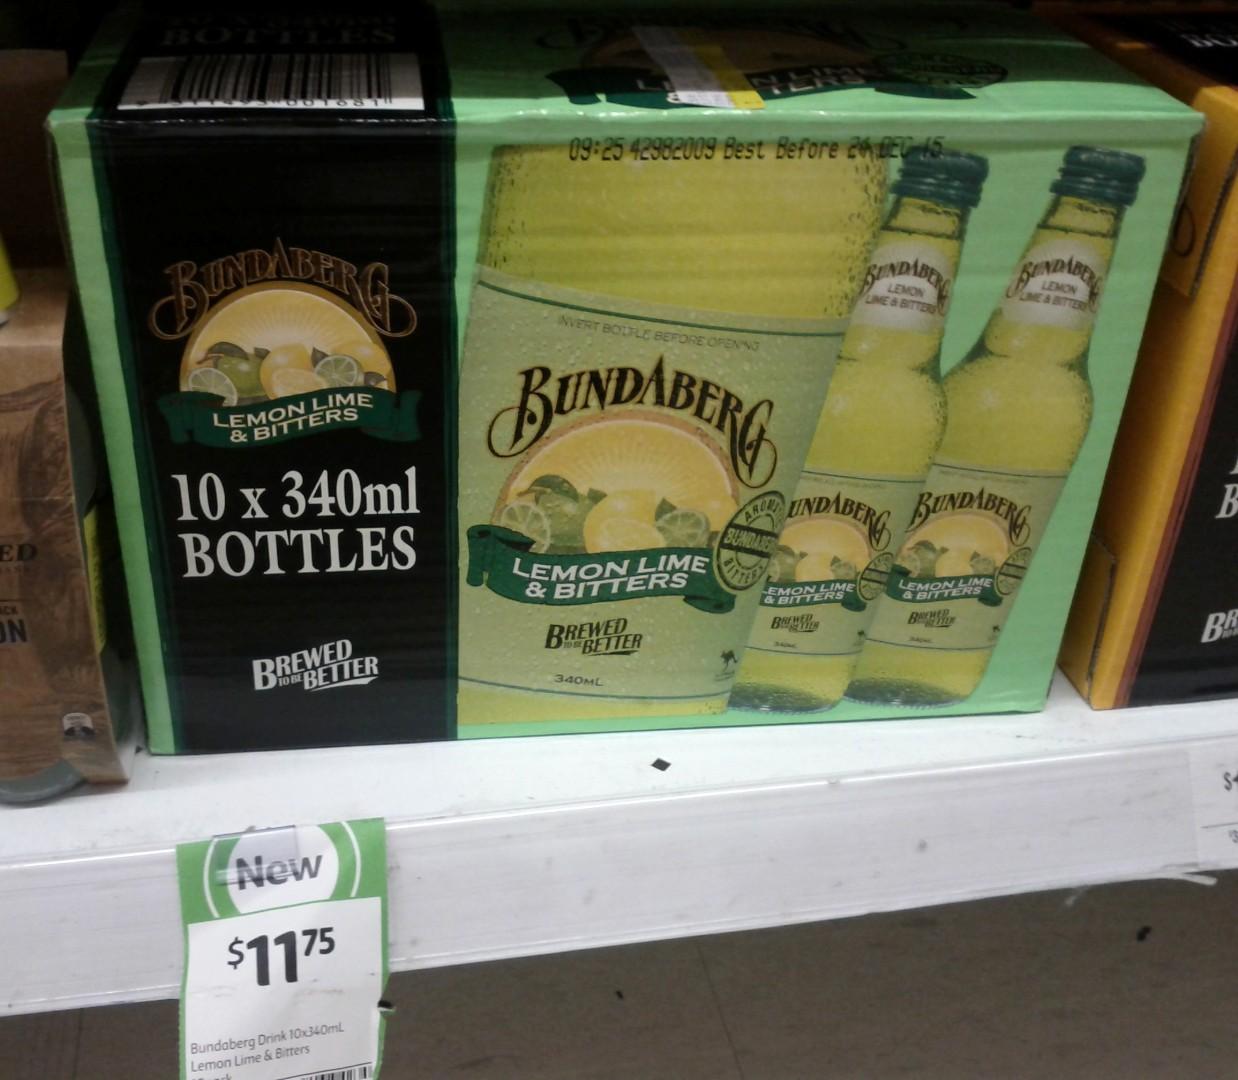 Bundaberg 10x340mL Lemon Lime & Bitters